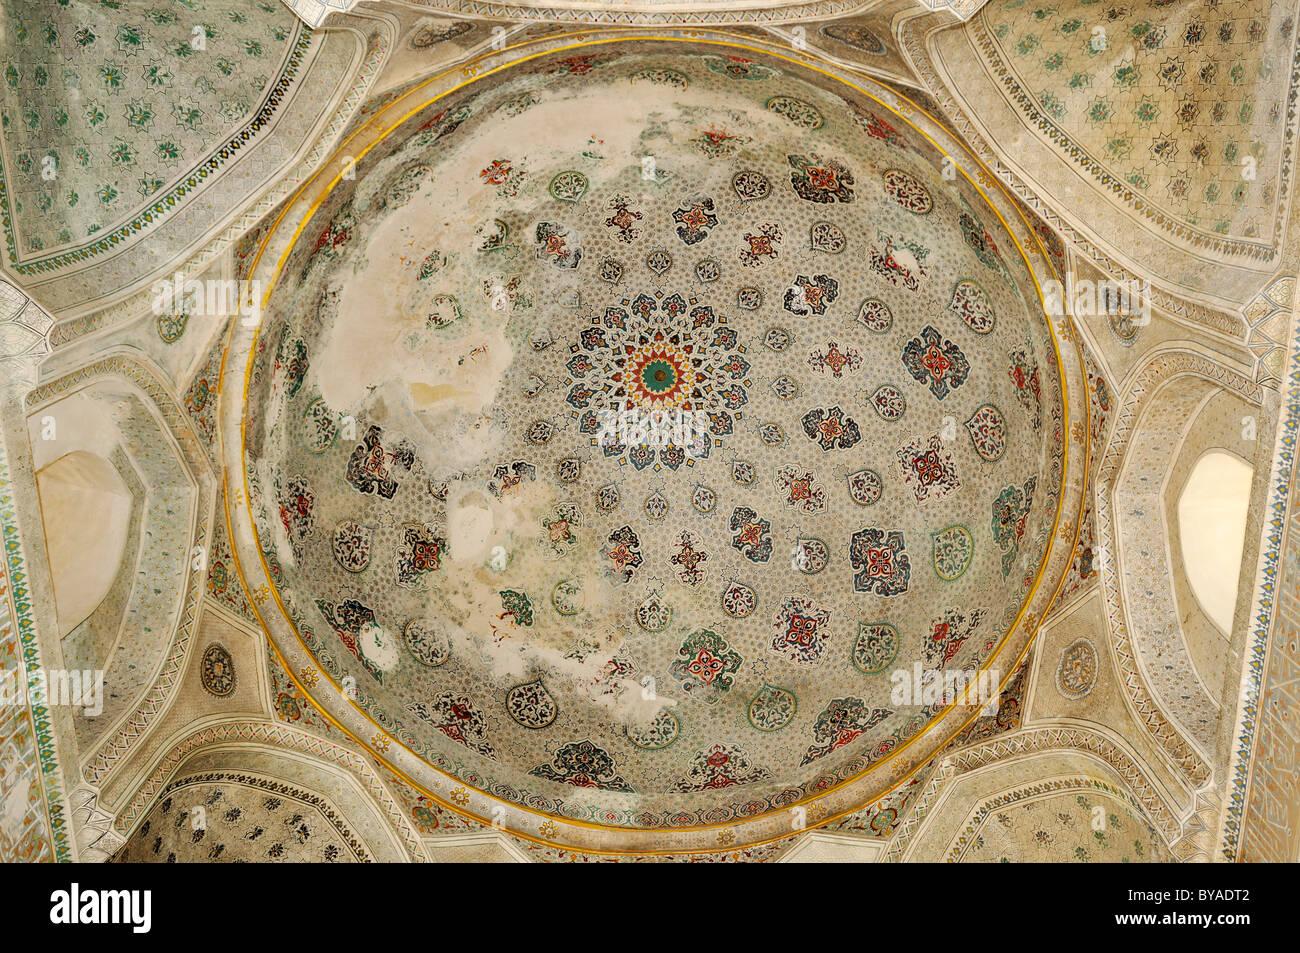 Painted interior cupola of Kok Gumbaz Mosque in Shahrisabz, Unesco World Heritage Site, Uzbekistan, Central Asia - Stock Image